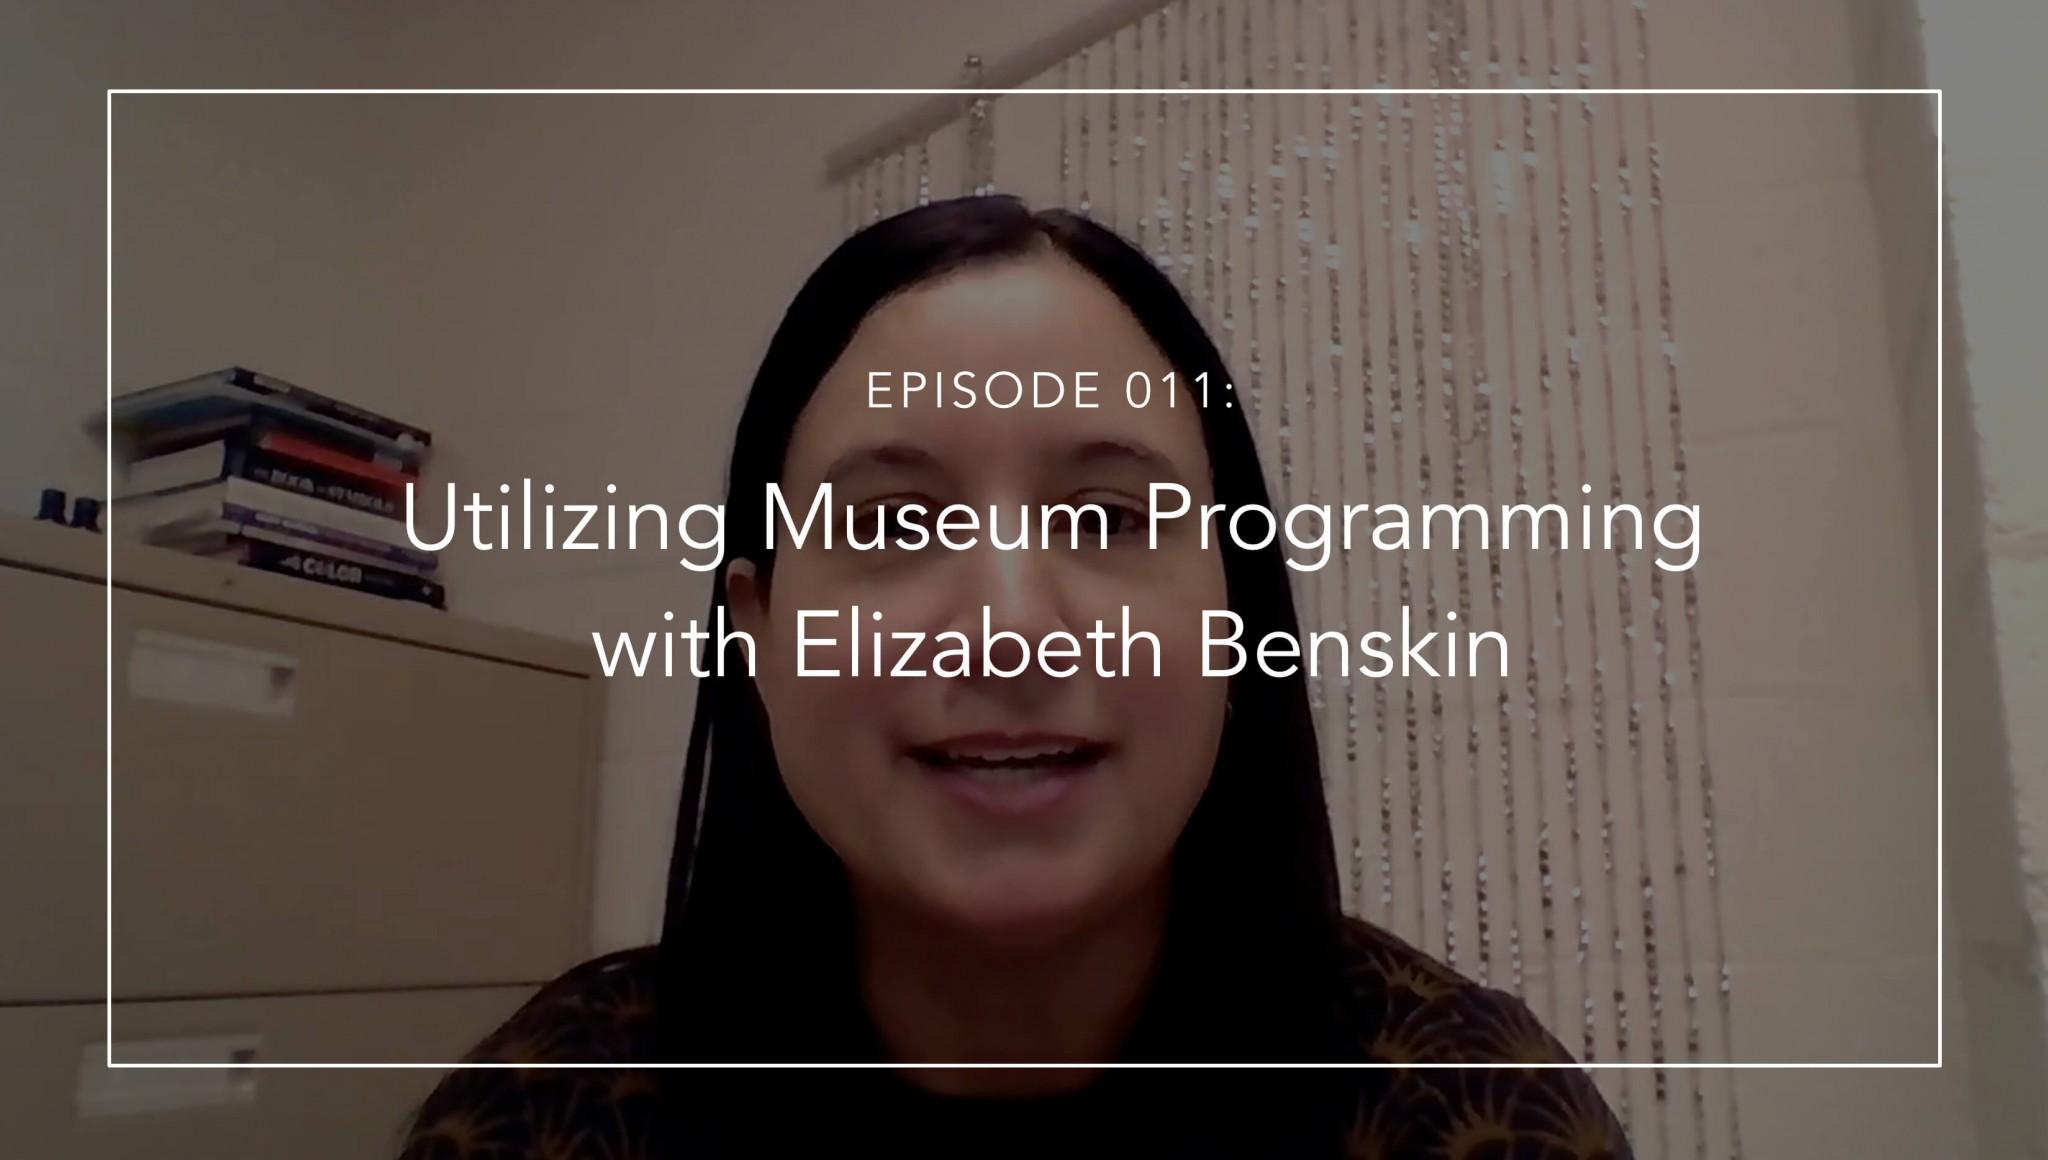 Utilizing Museum Programming with Elizabeth Benskin